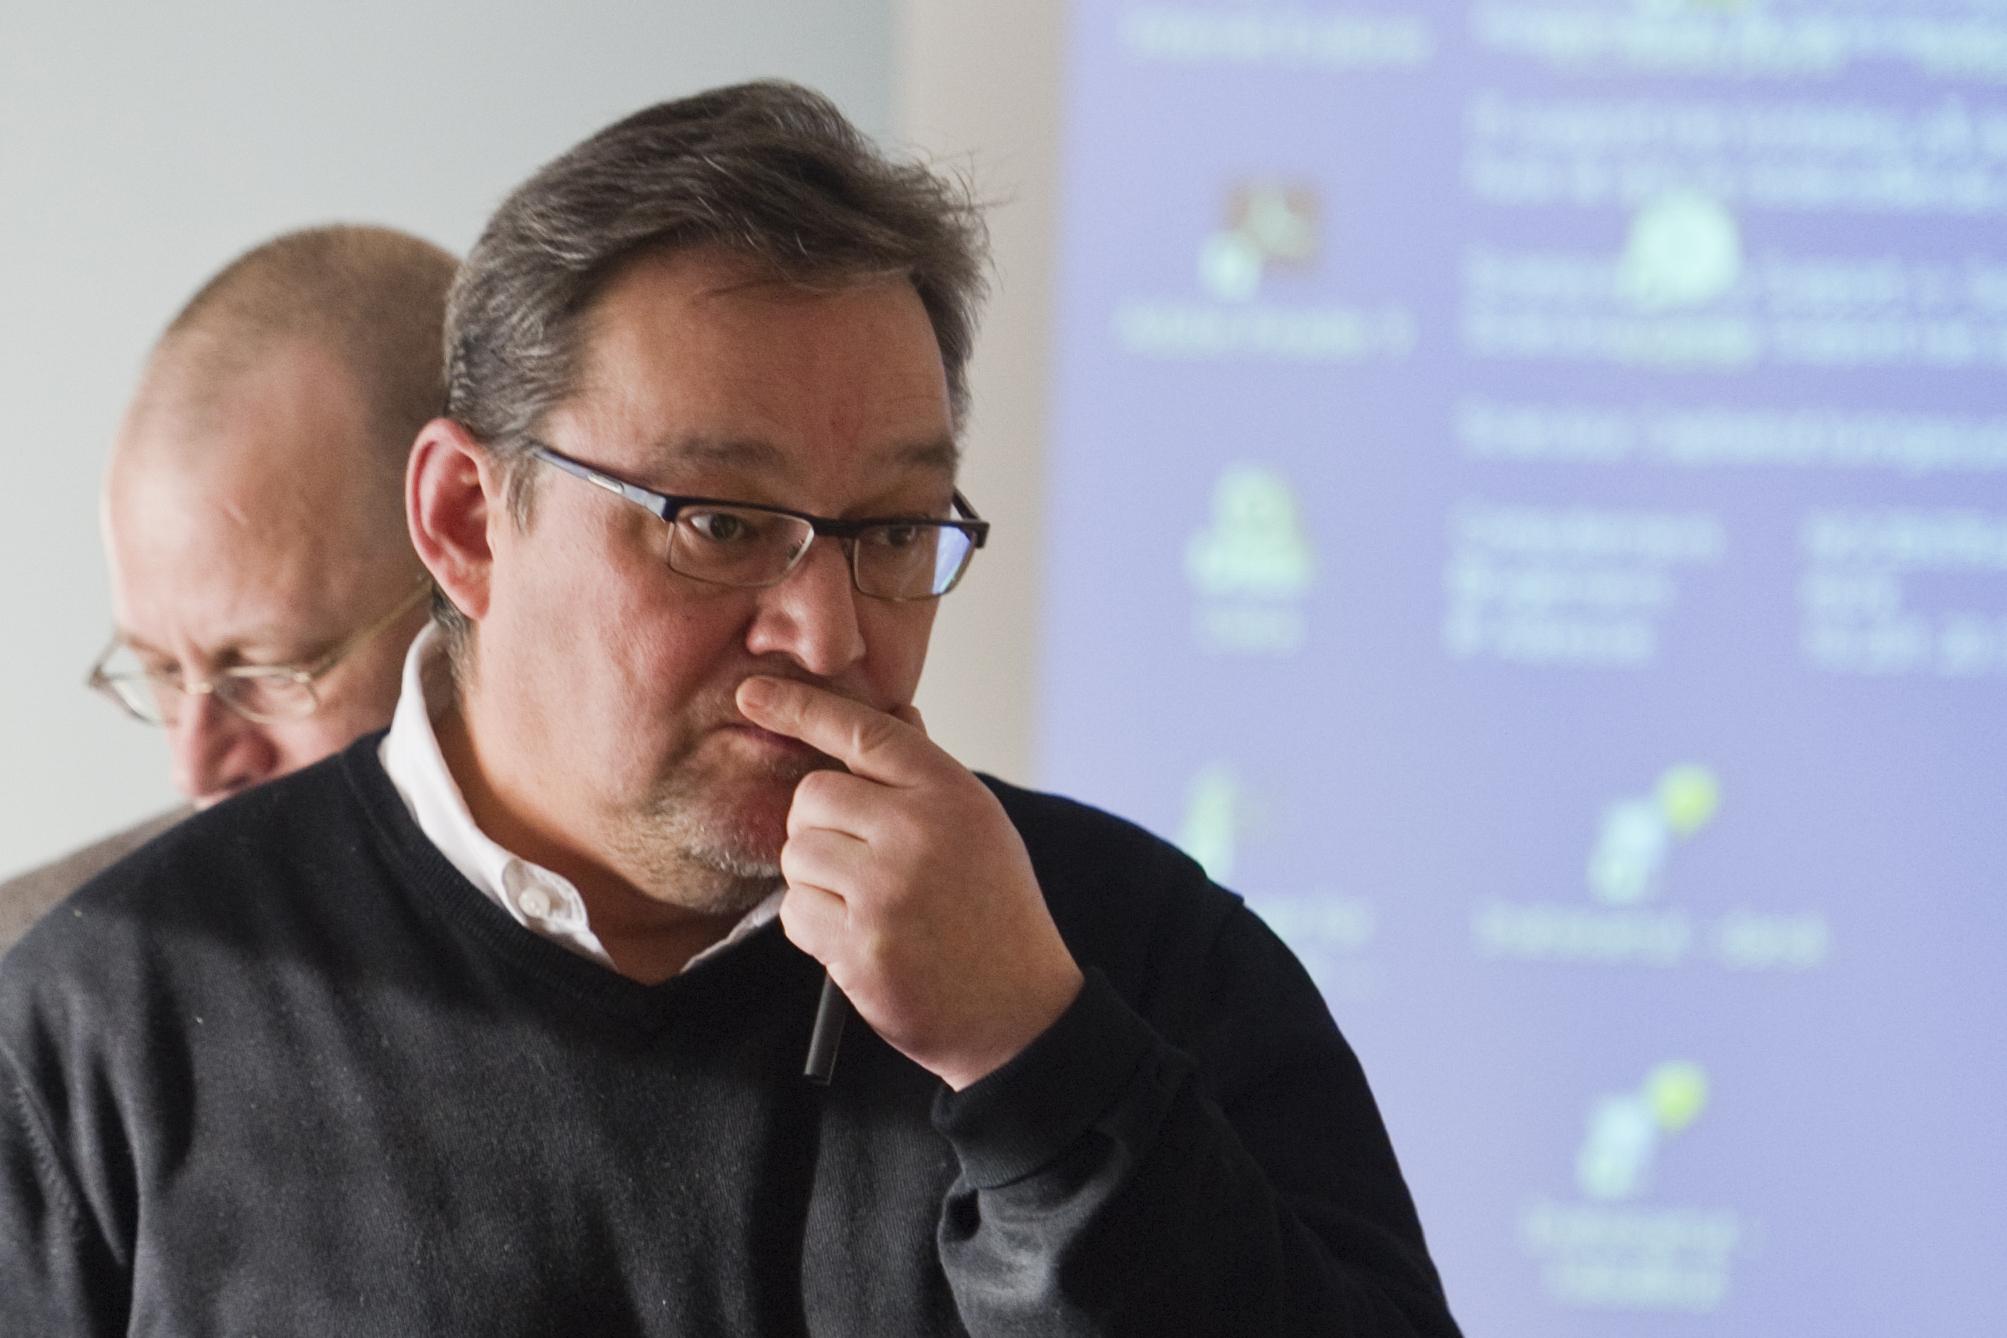 Advarer mod Facebook-politik | Sermitsiaq.AG